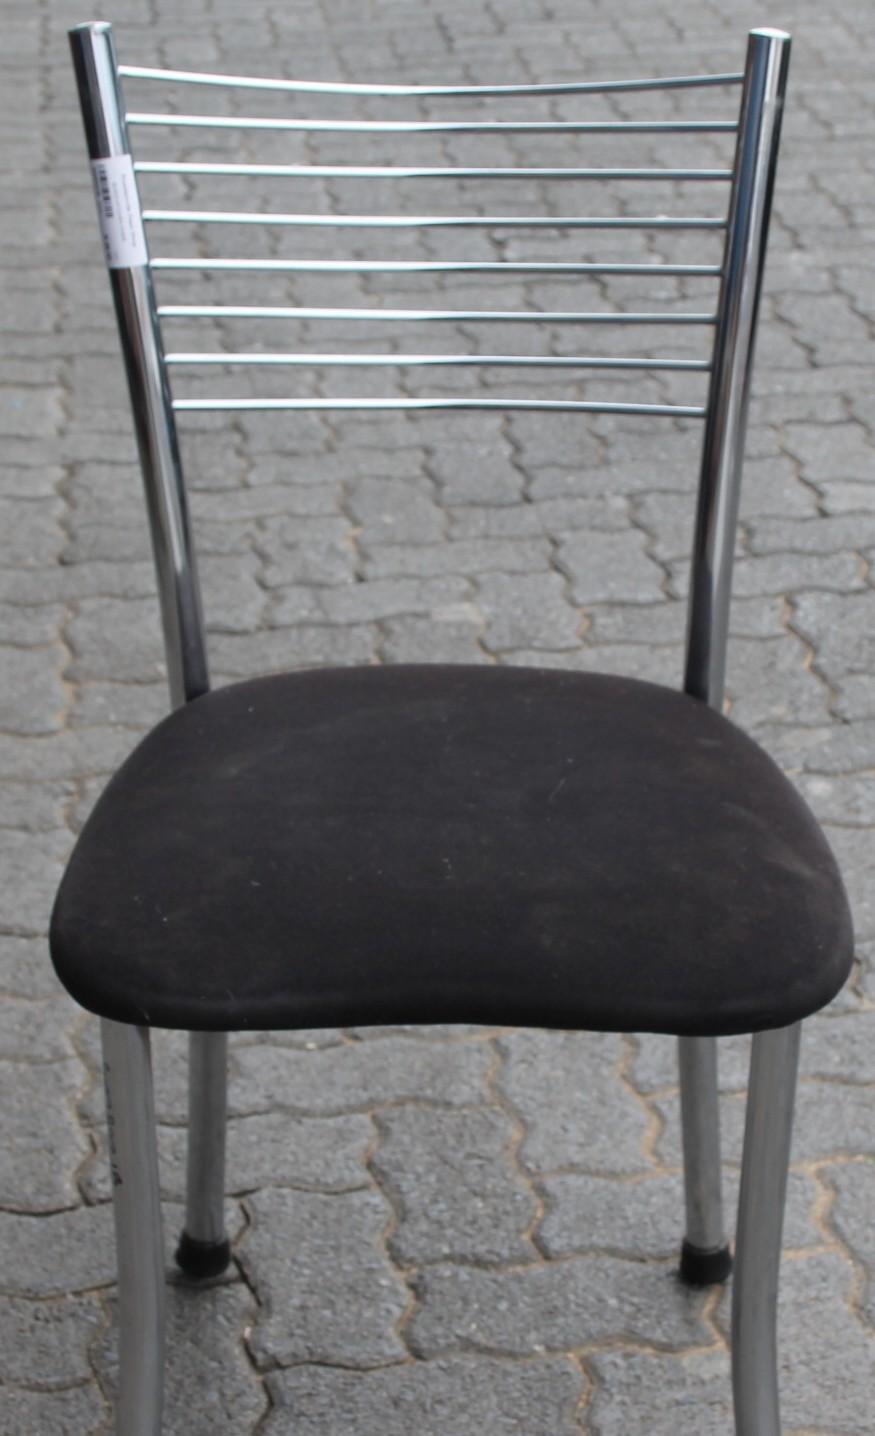 Kitchen chair S028253b #Rosettenvillepawnshop